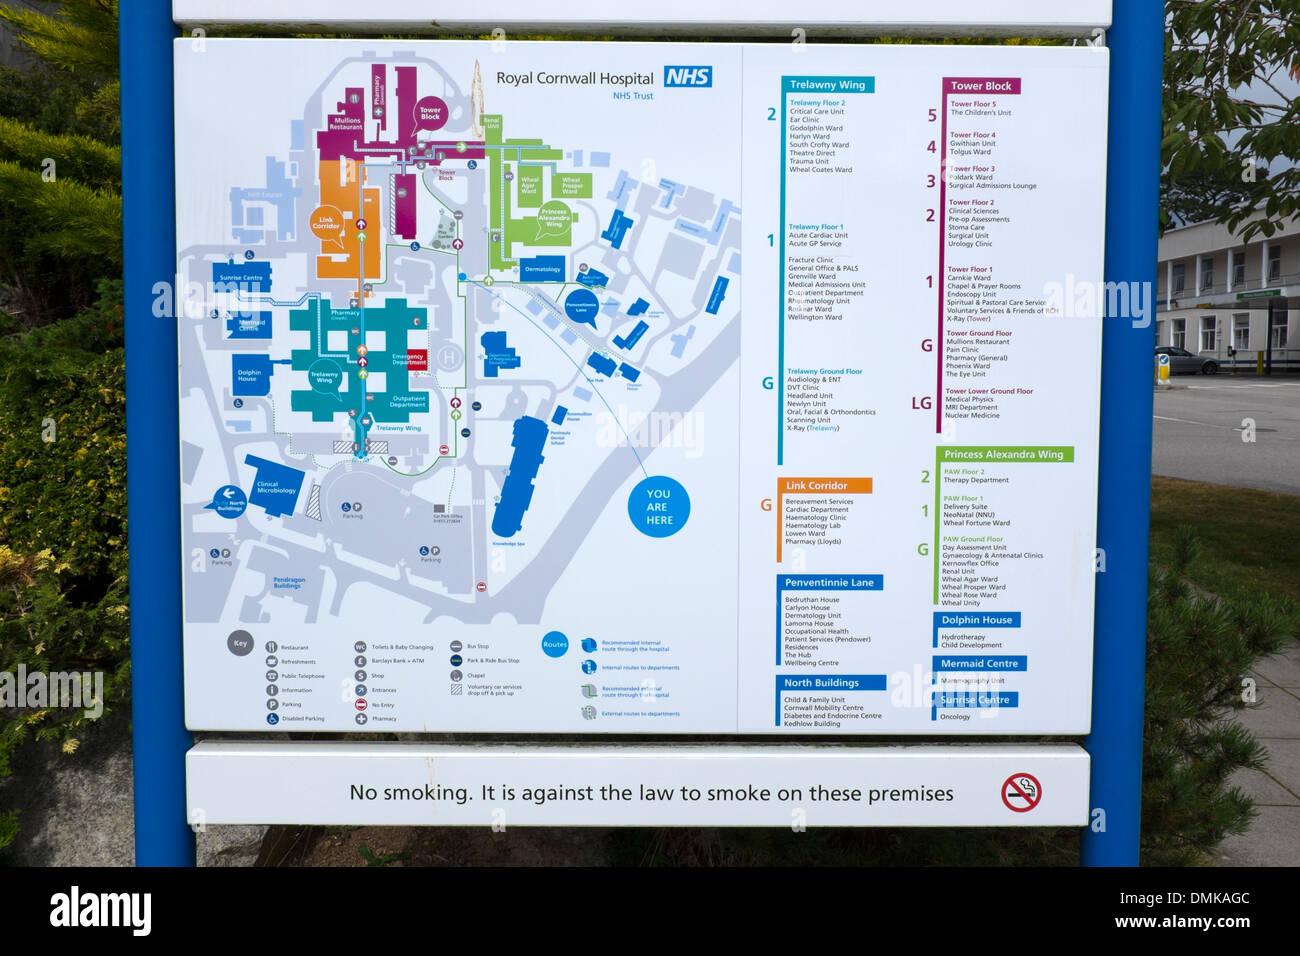 Treliske Hospital Map Royal Cornwall Hospital NHS Site Map Stock Photo: 64349612   Alamy Treliske Hospital Map